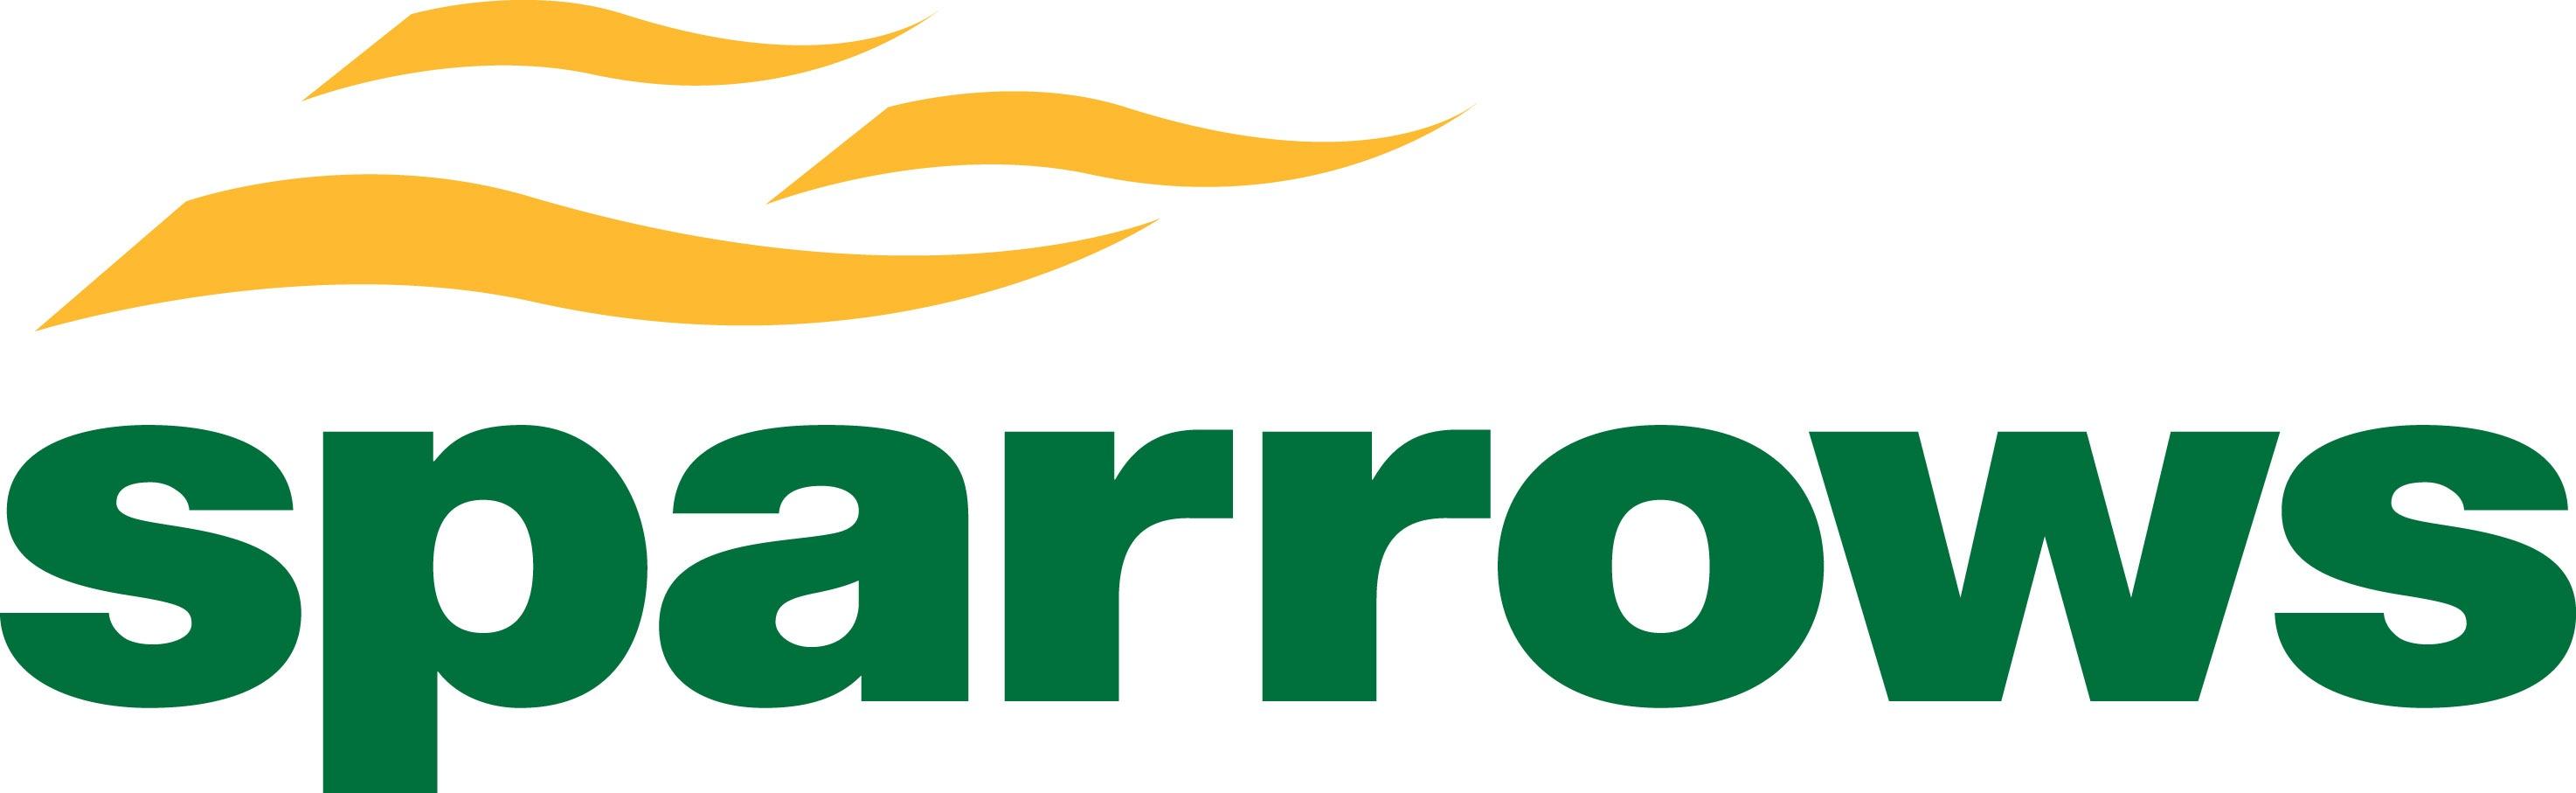 Sparrows_Logo_2011.jpg